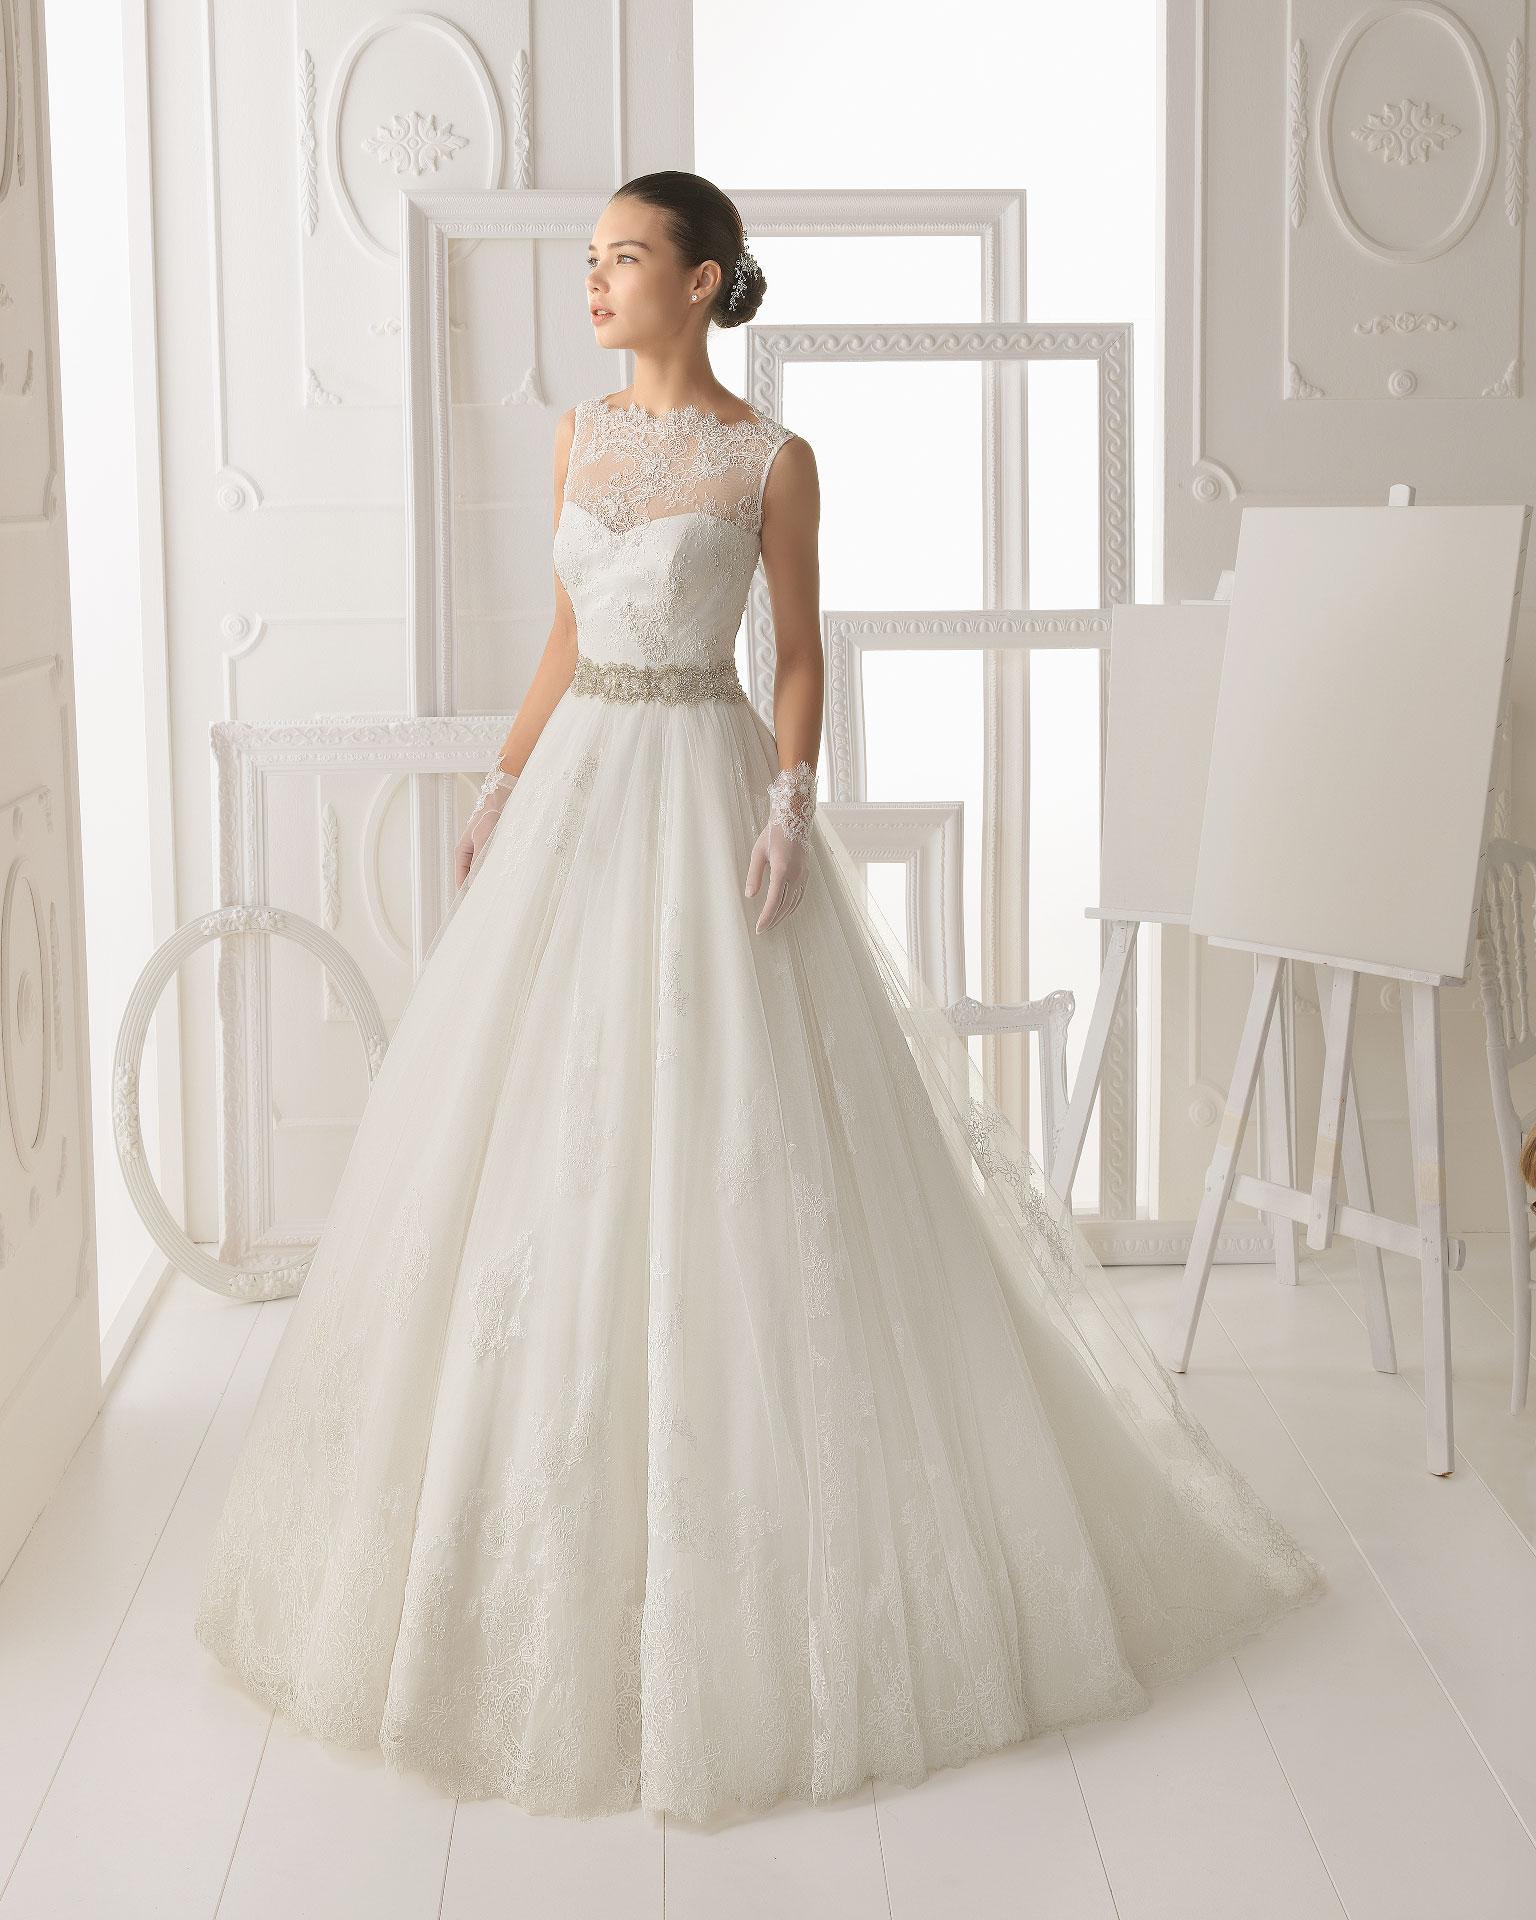 Aire barcelona wedding dress 2014 bridal omero for Wedding dresses in barcelona spain